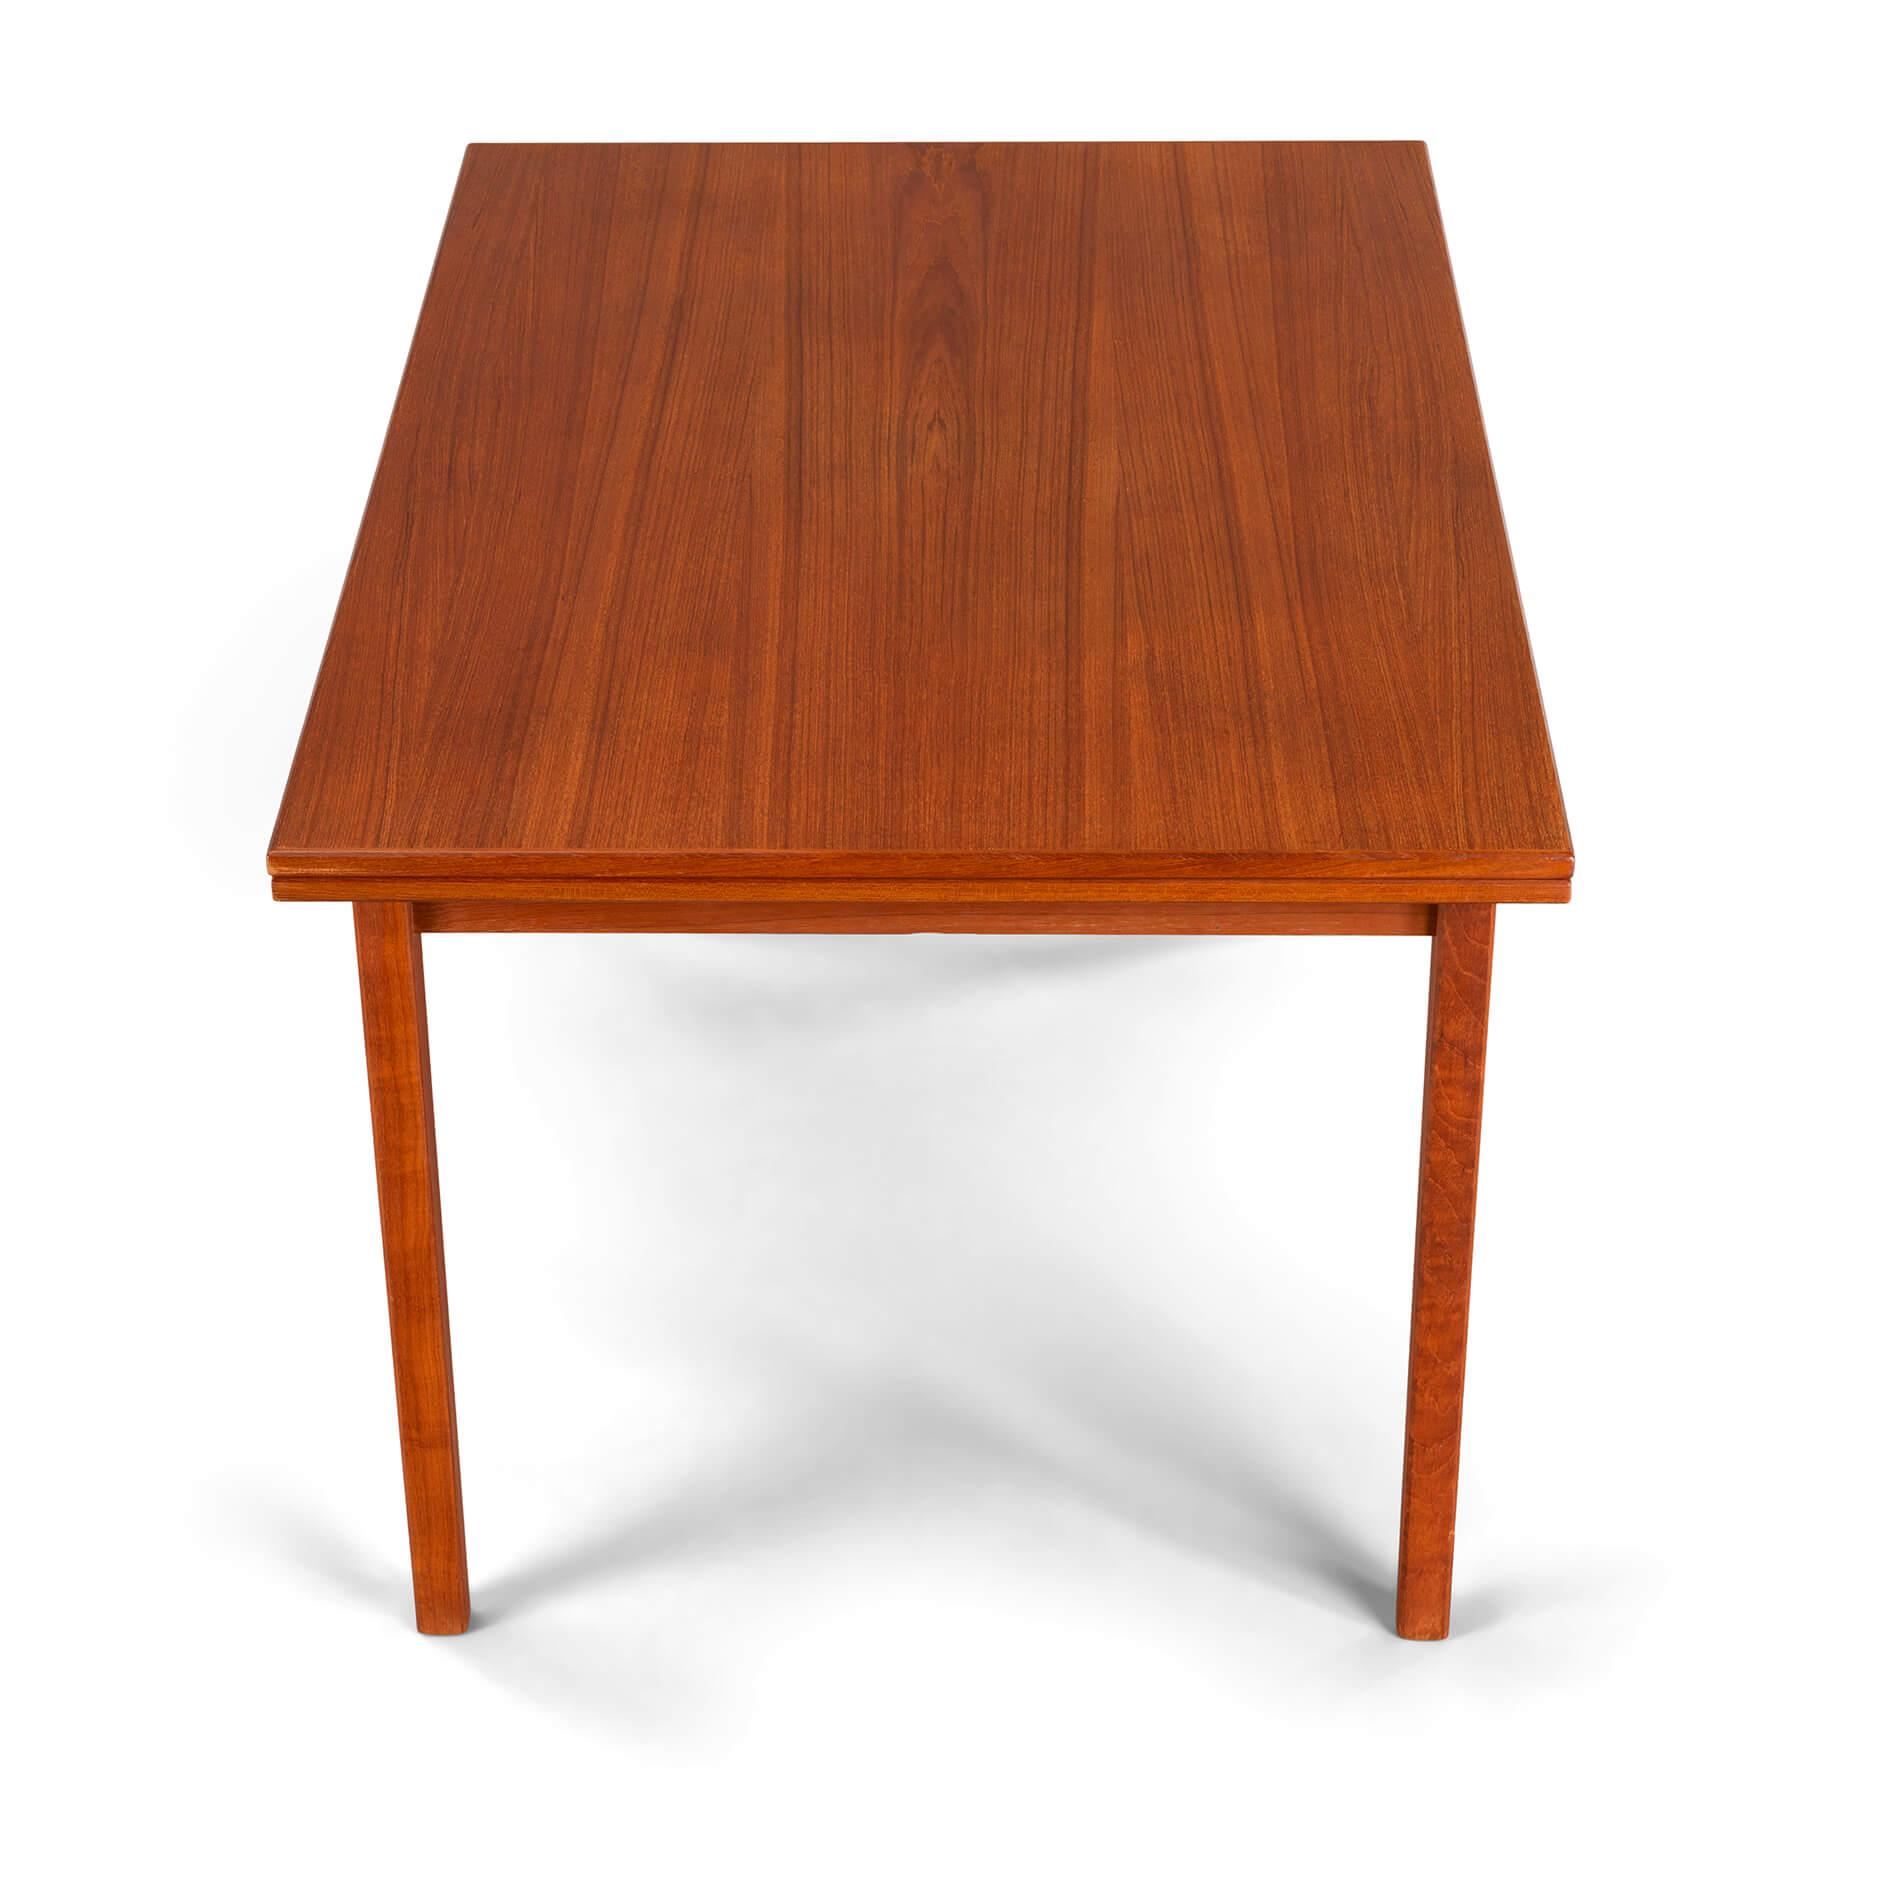 Eetkamer Tafel Teak.Sold Eetkamer Tafel Teak Furnip Mid Century Design